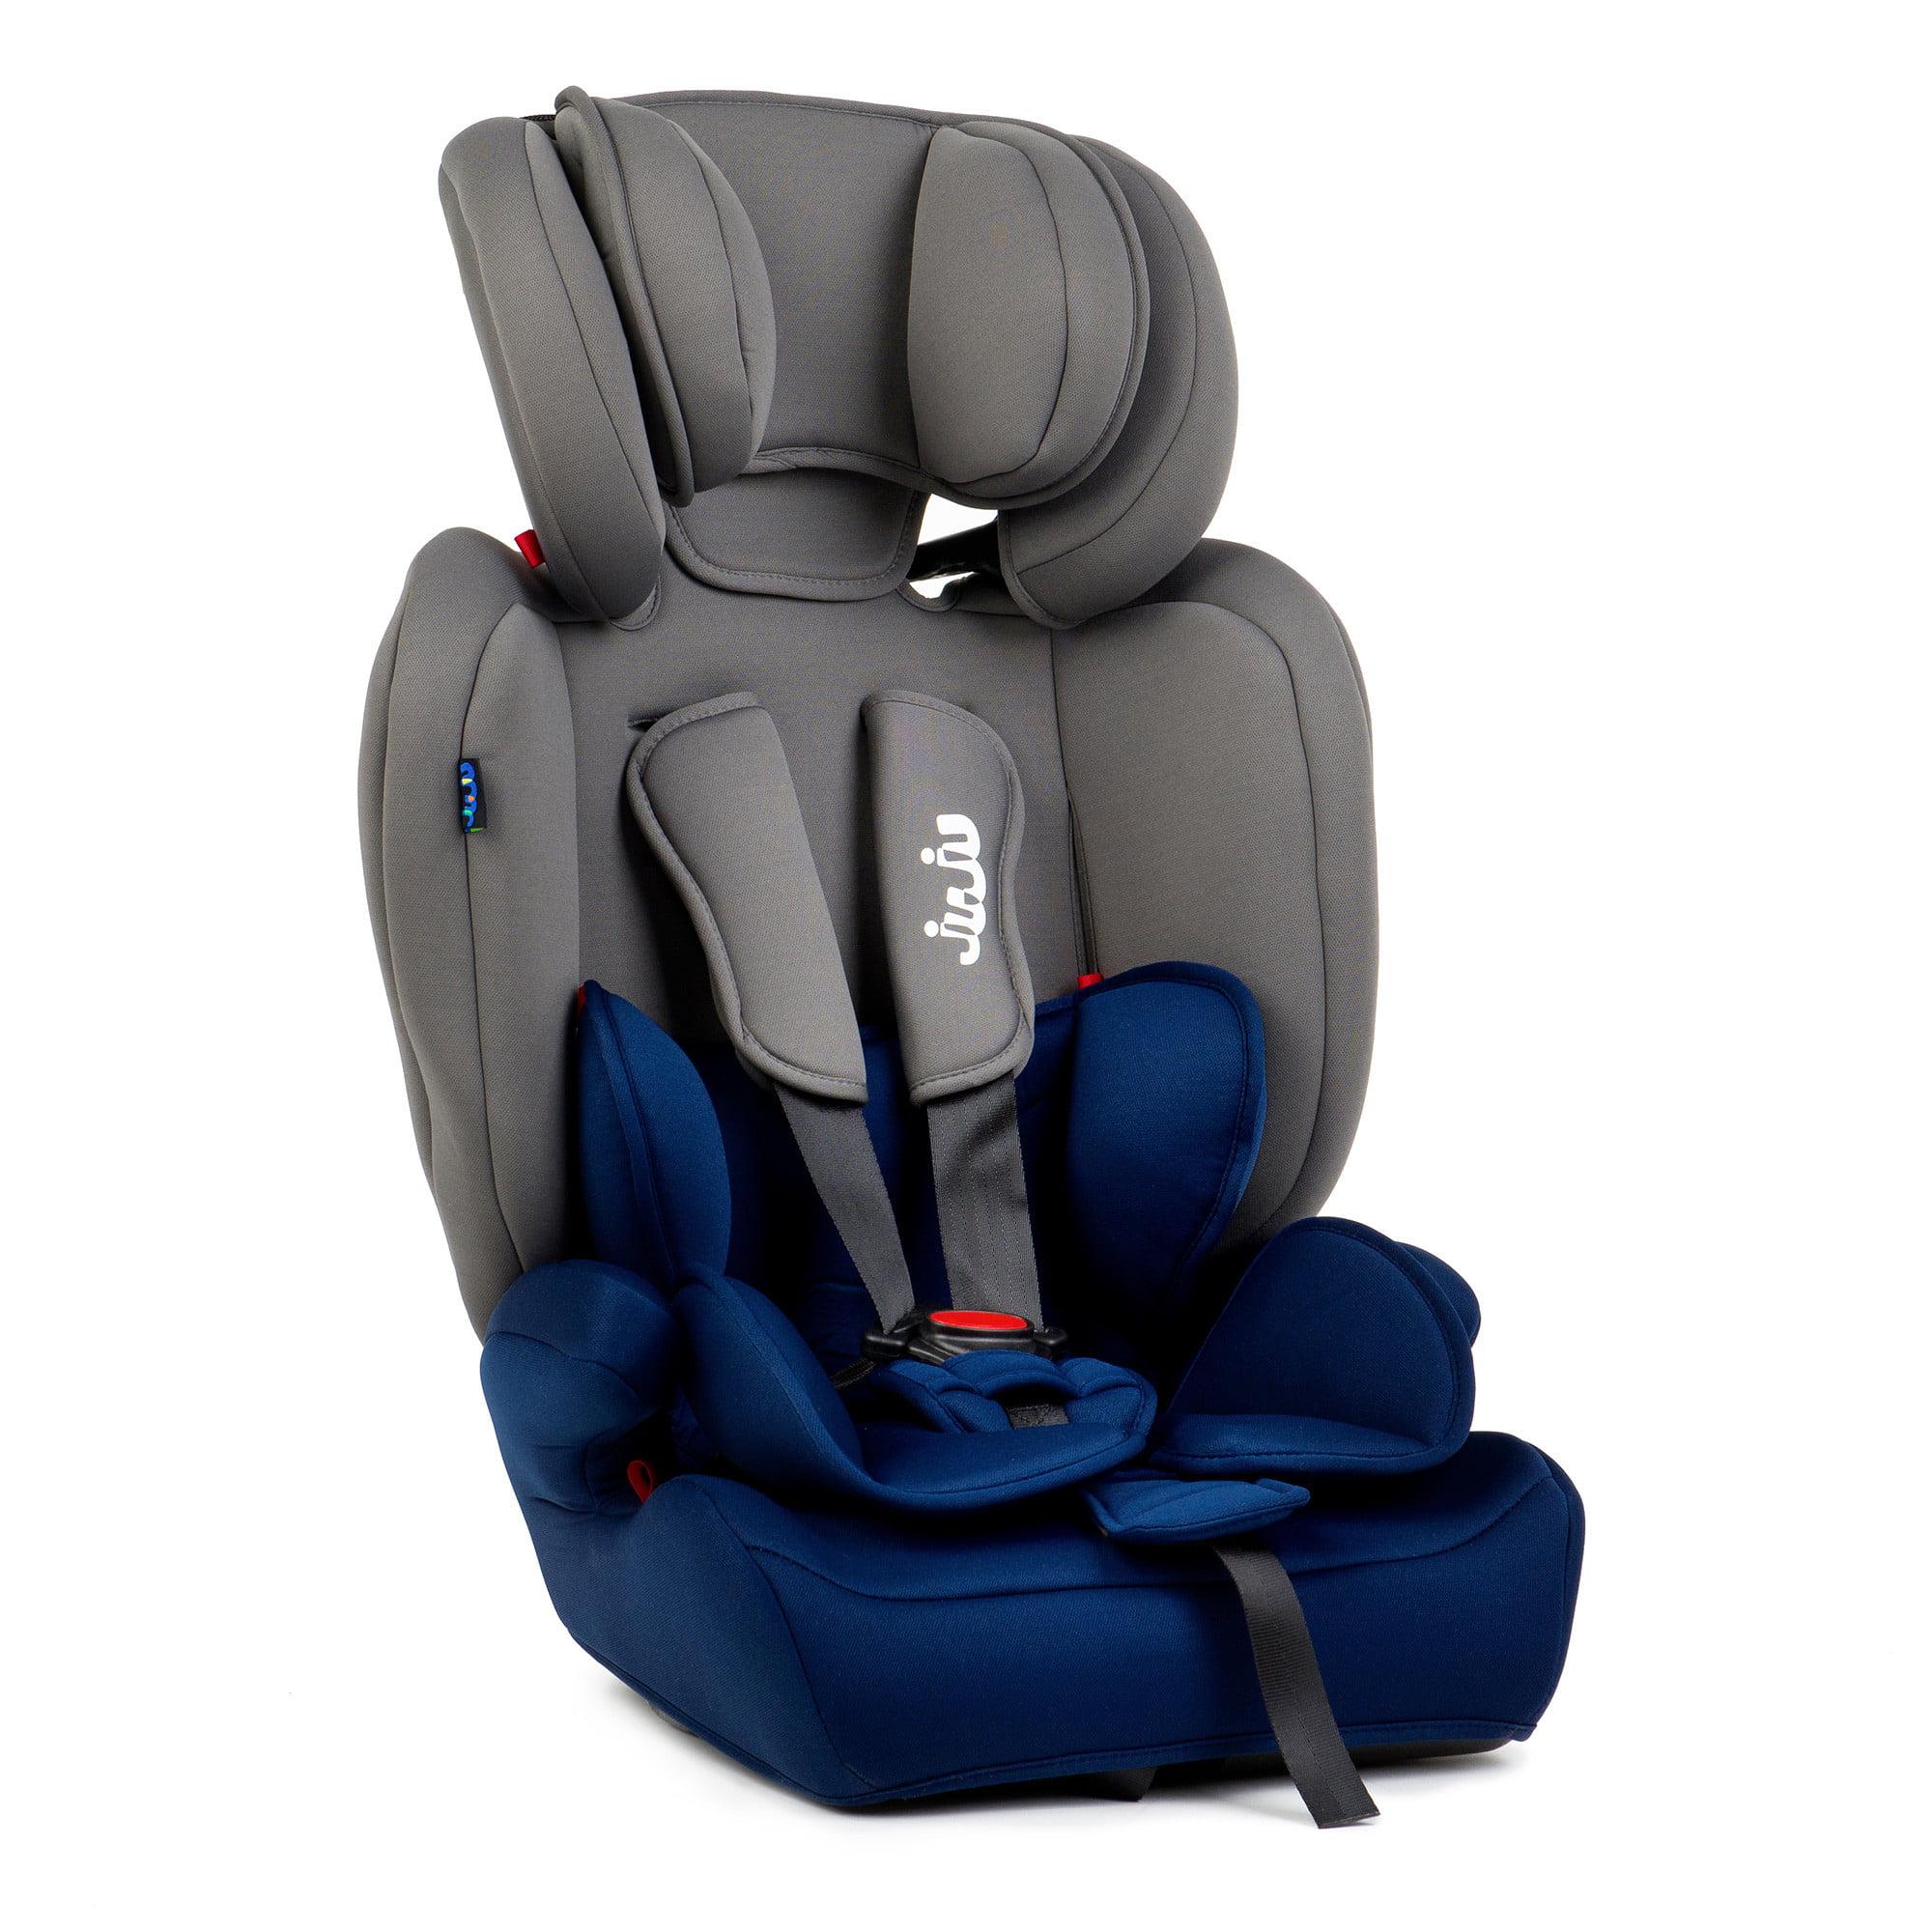 Scaun Auto Juju Safe Rider, Gri-Bleumarin